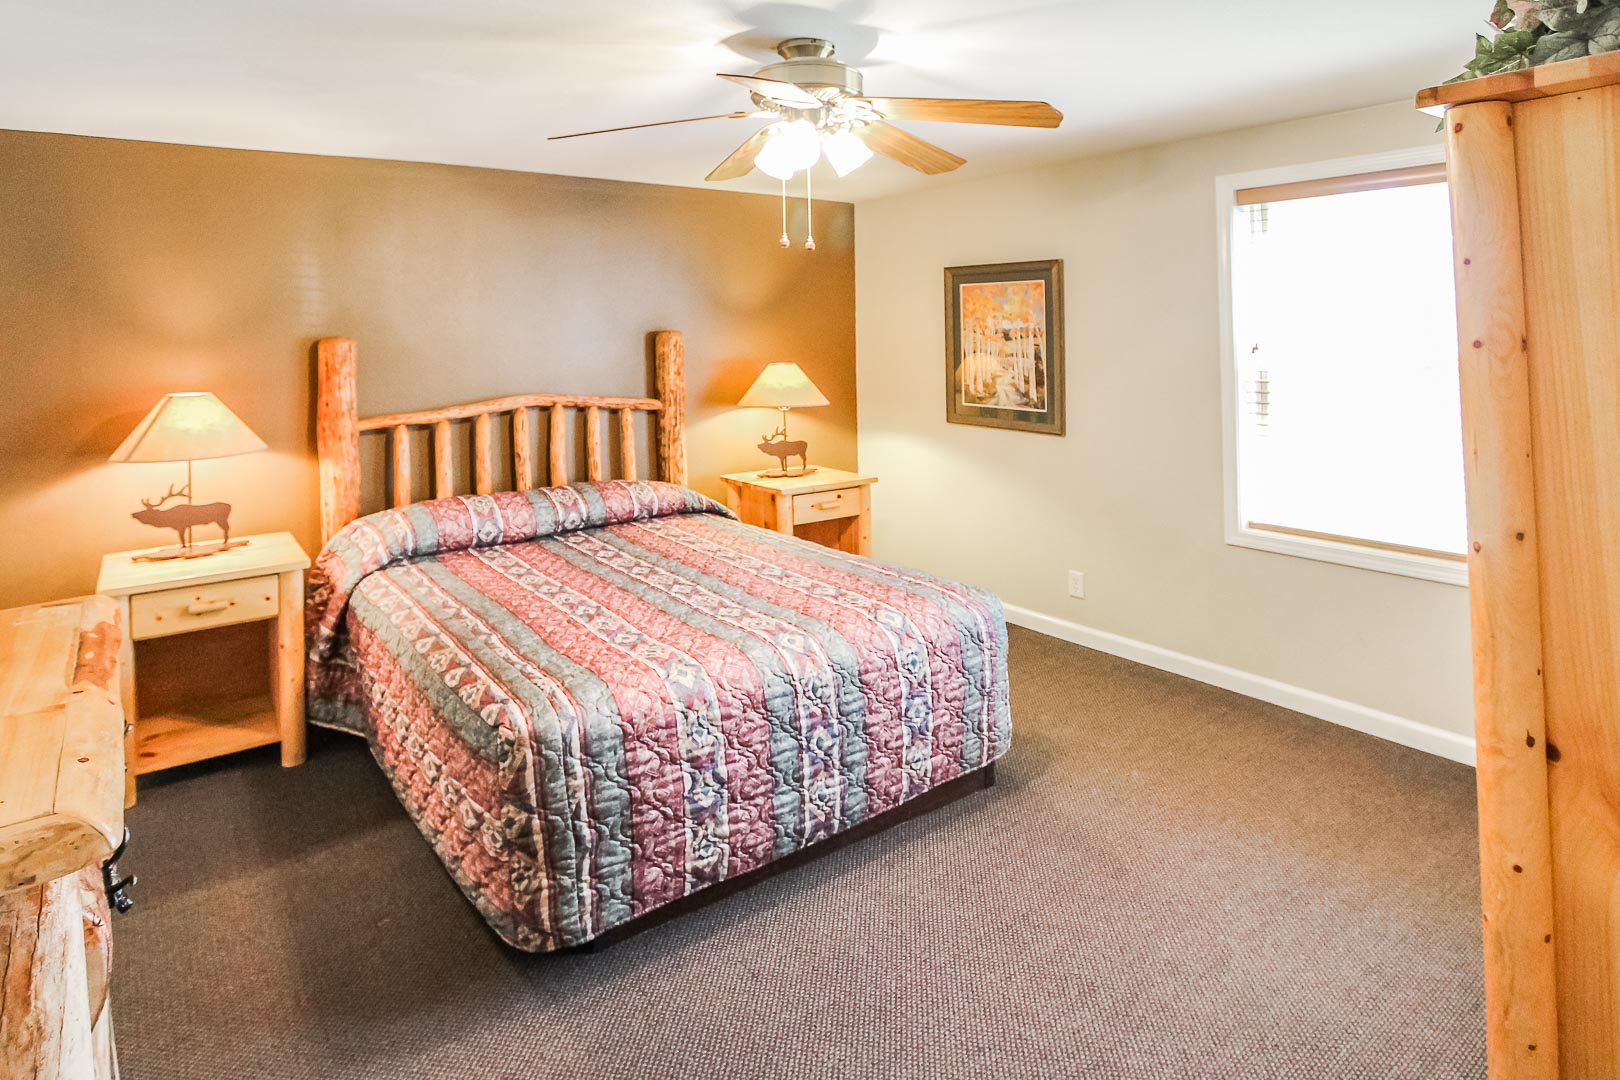 Jackson Pines - Unit Amenities - Bedroom